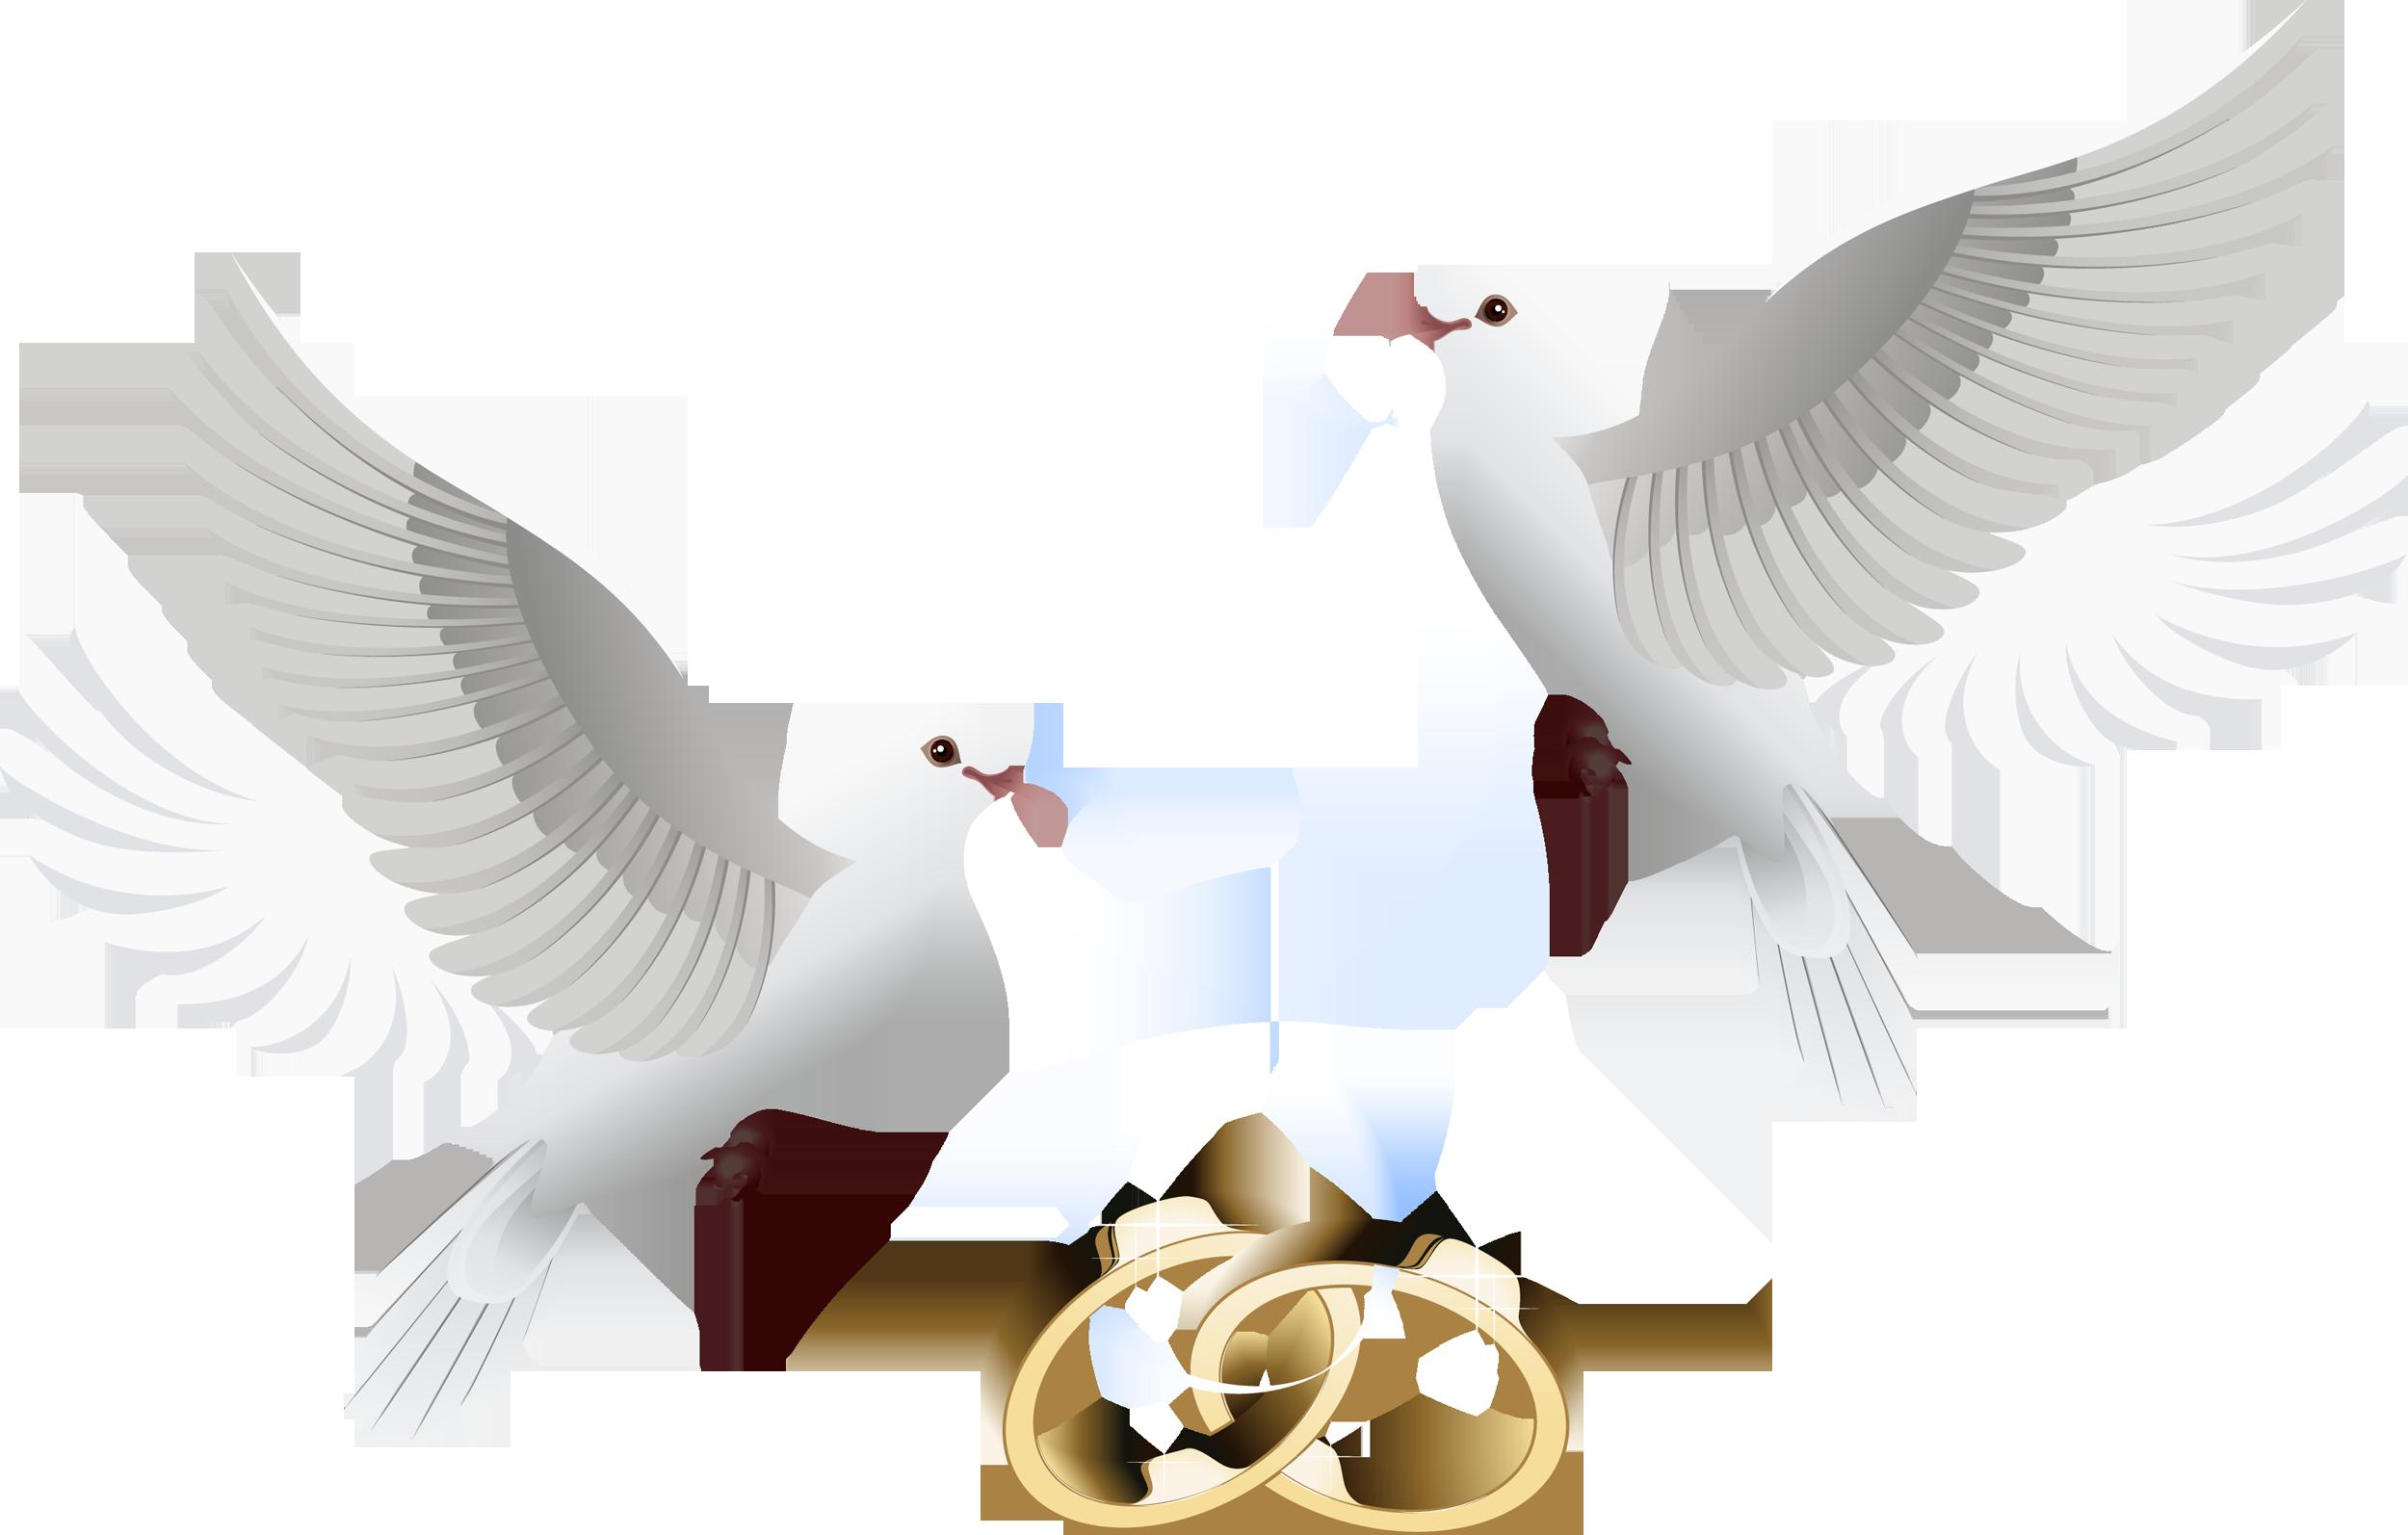 0_16a983_2c0f79aa_orig.png (2500×1594) Wedding doves